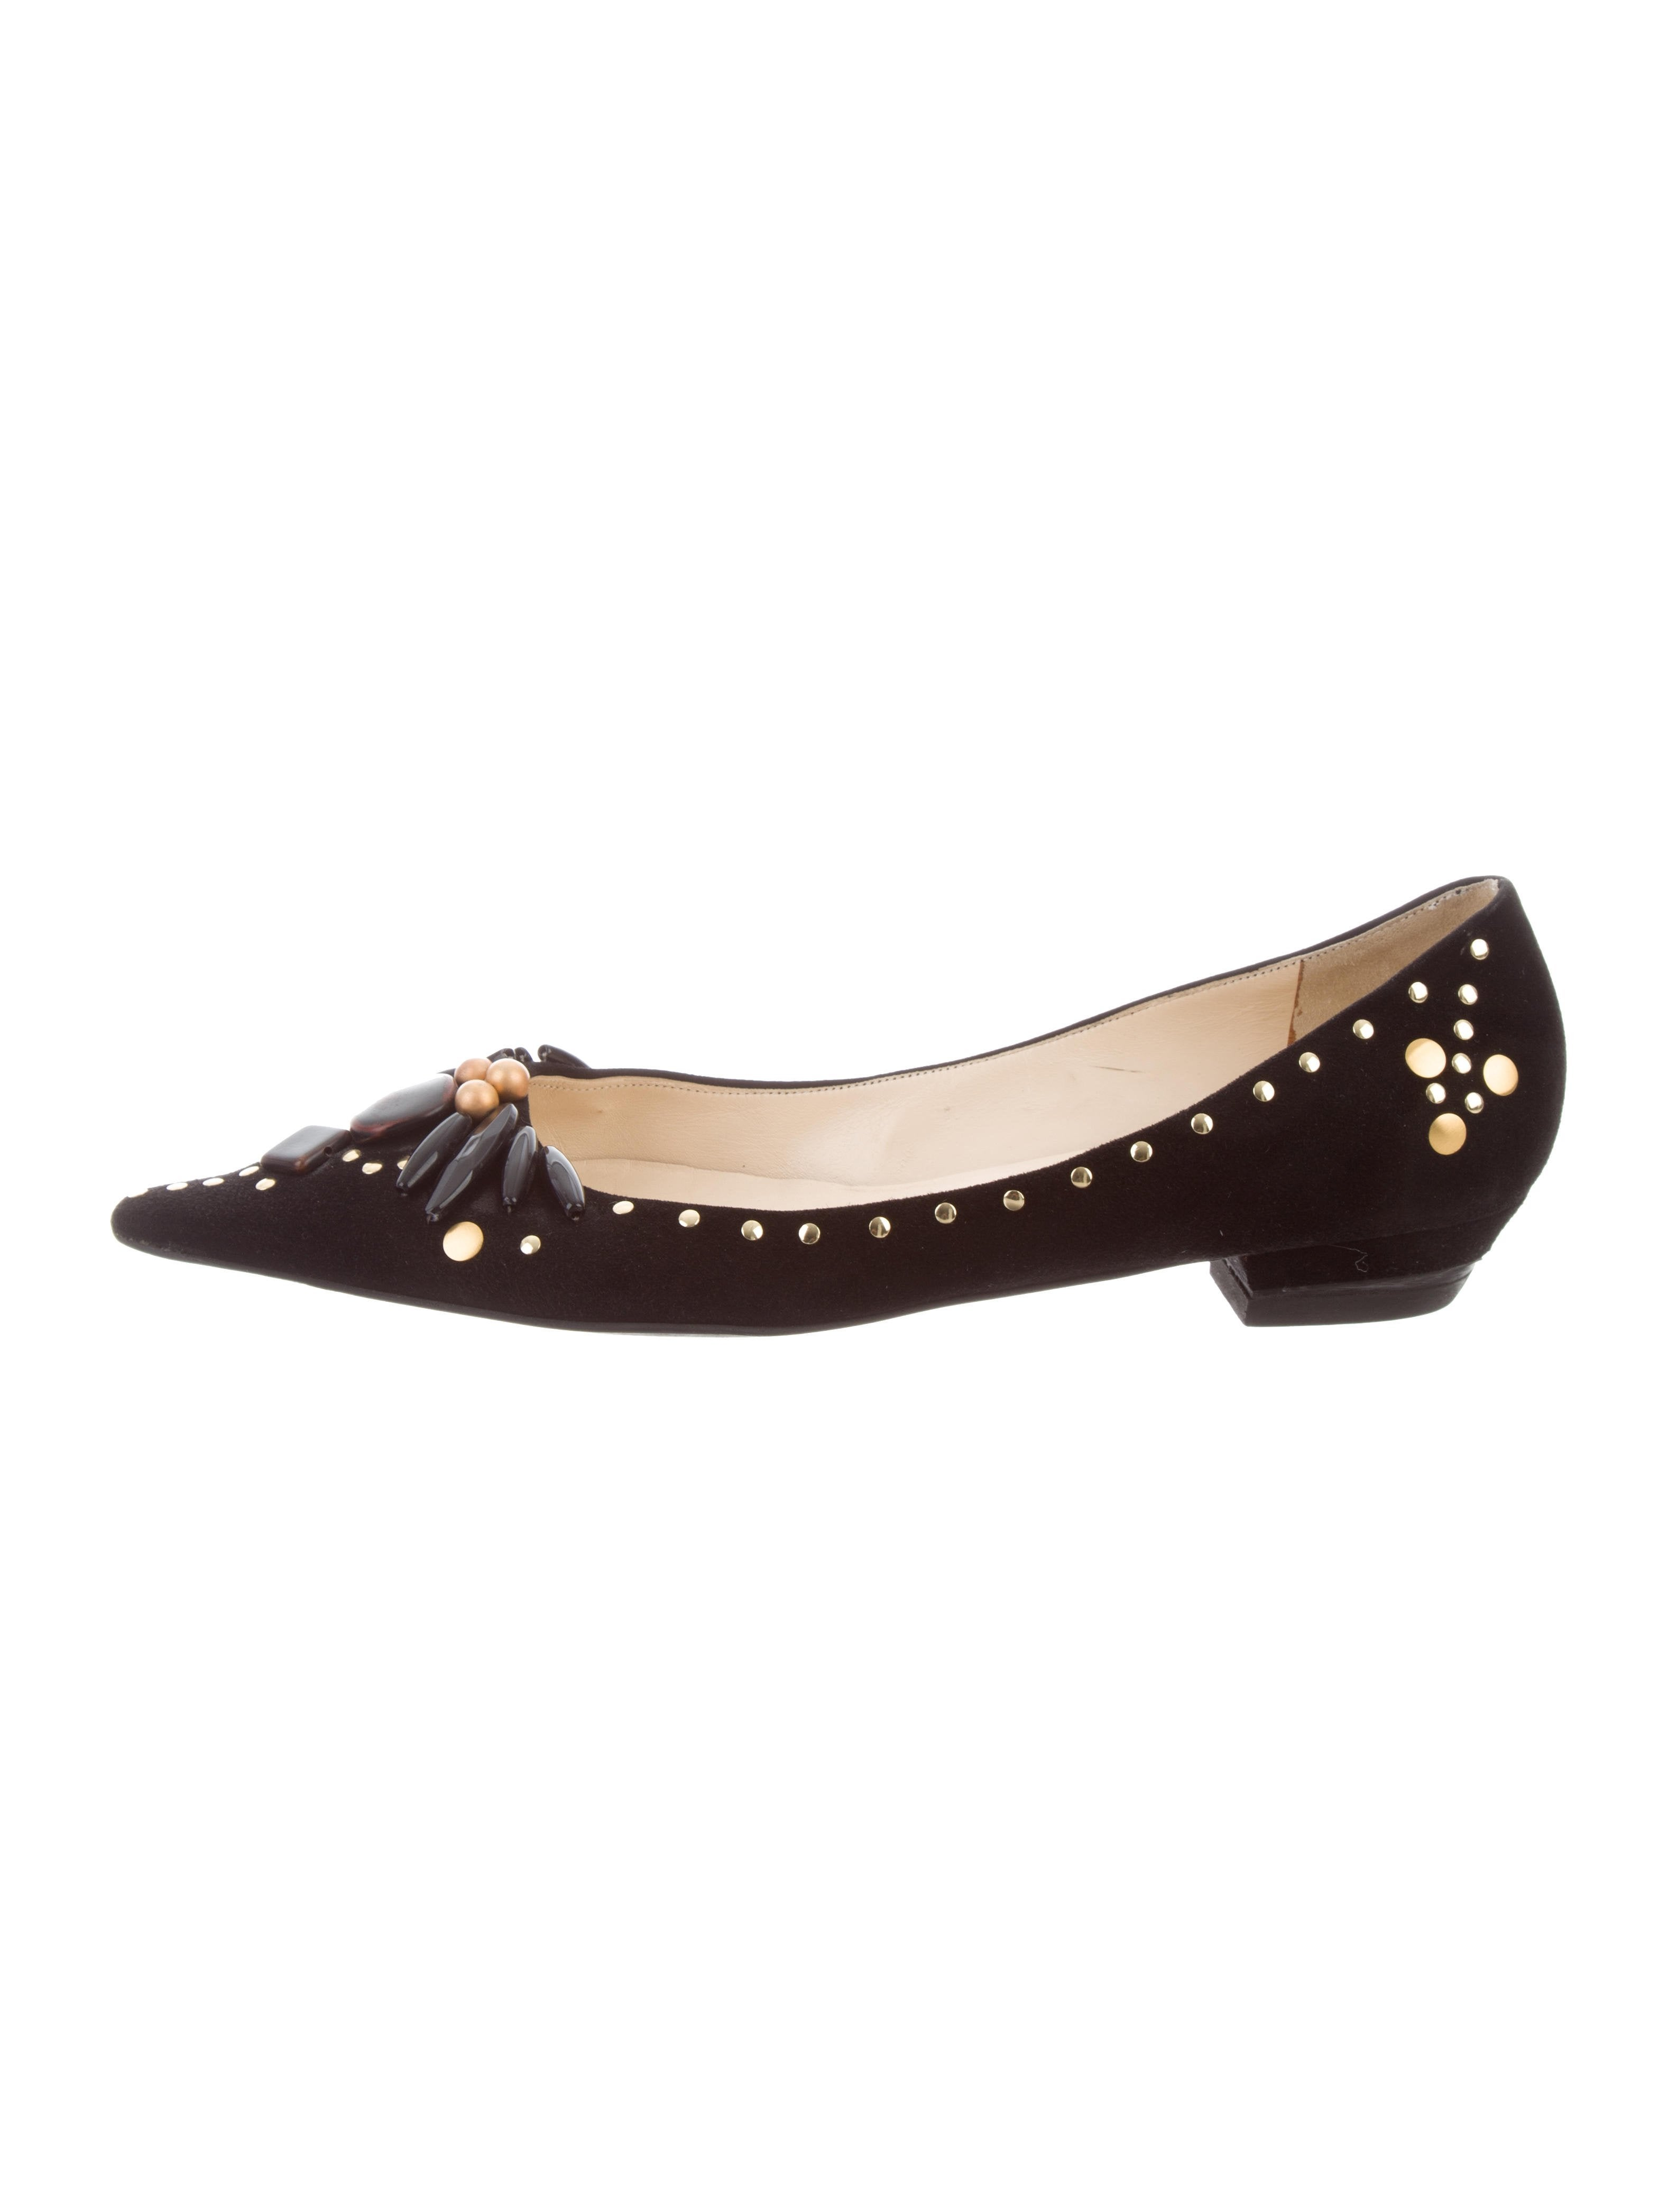 Donna Karan Embellished Pointed-Toe Flats cheap sale wiki cheap for sale CVguPeT7km